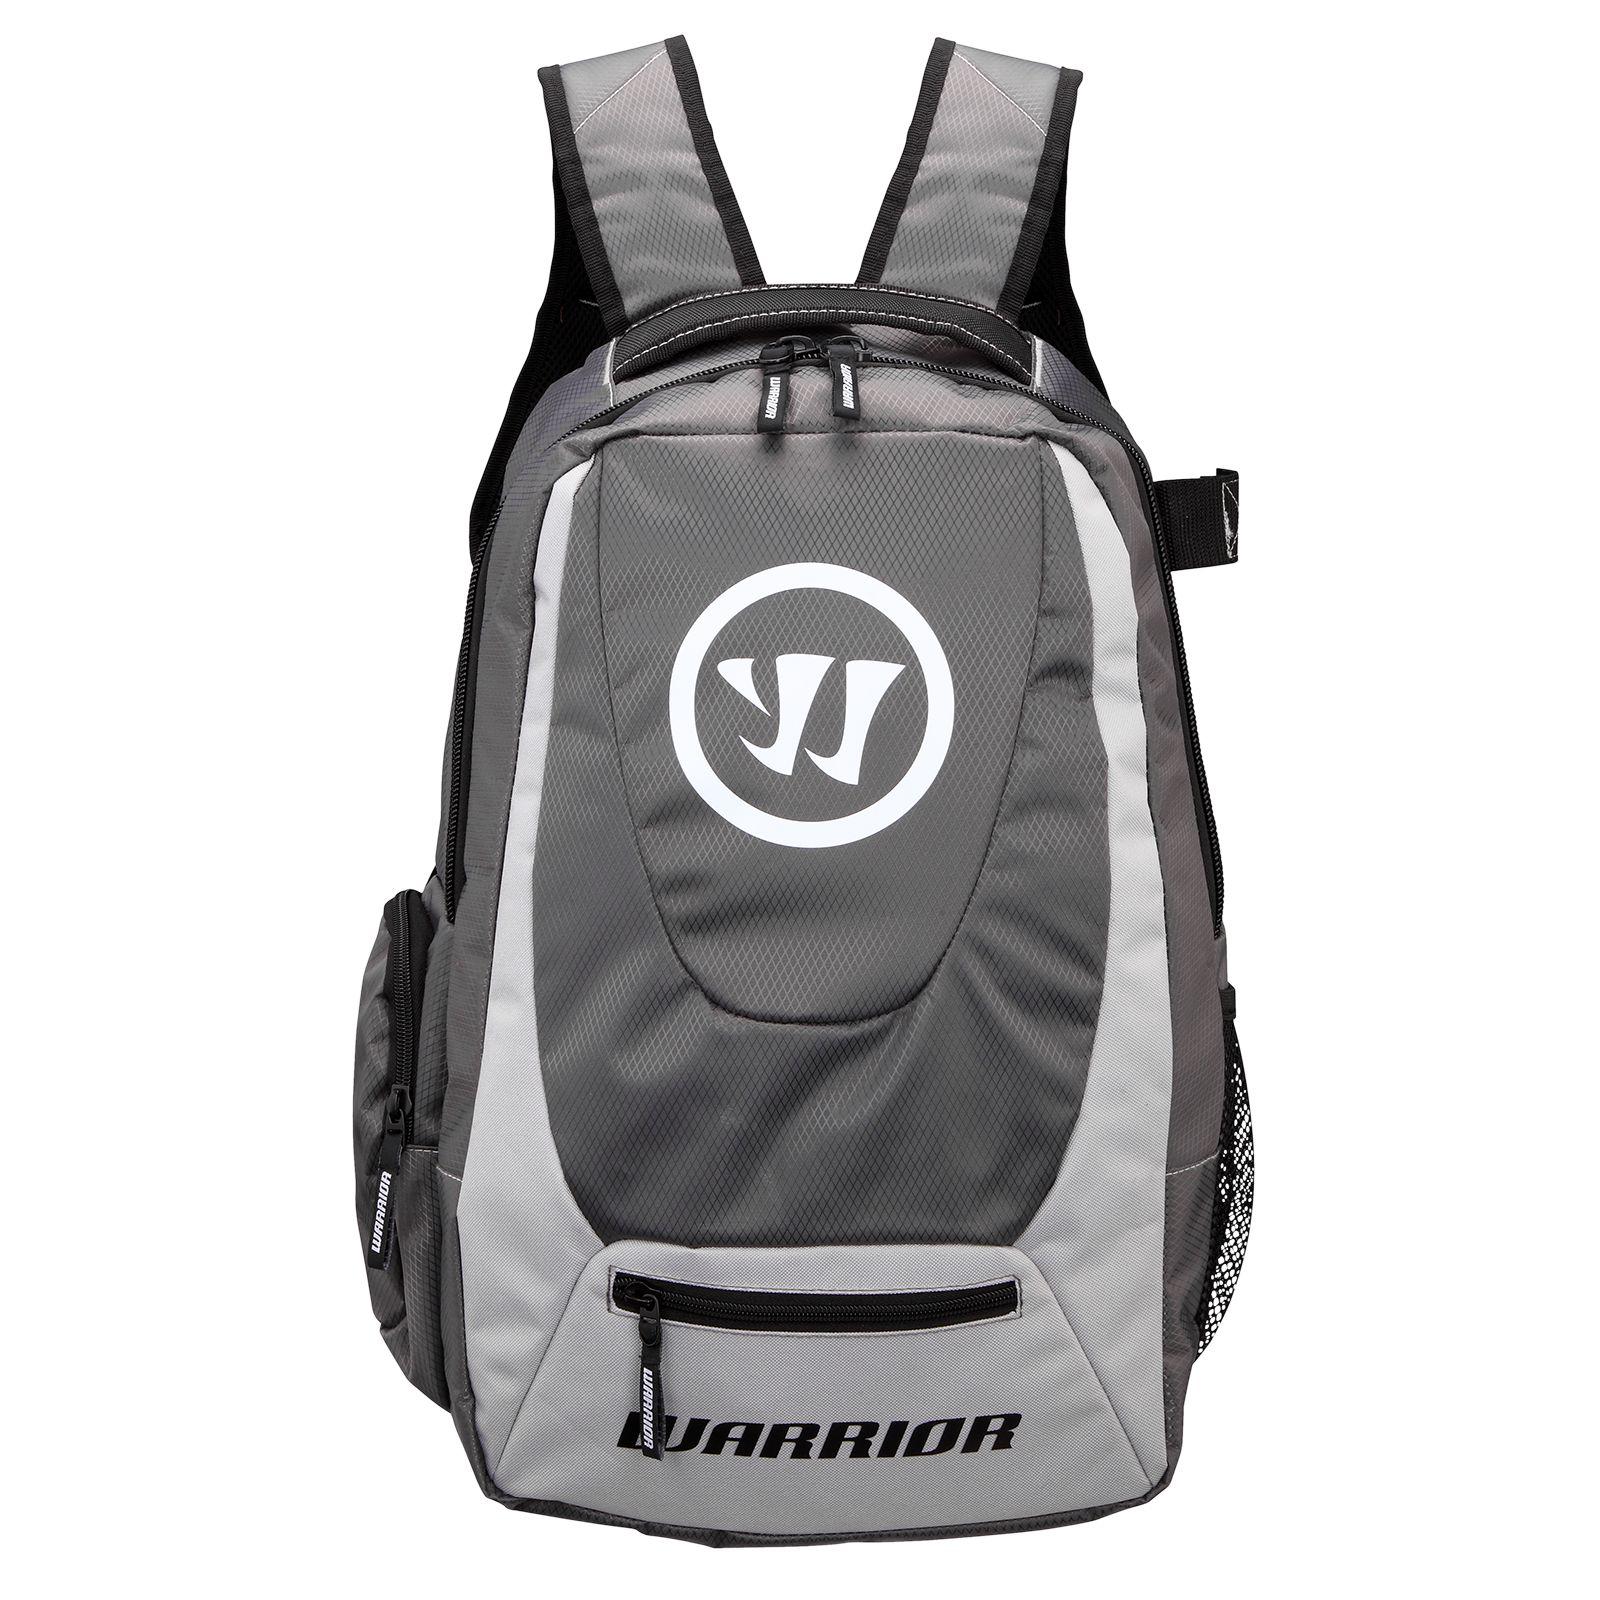 Warrior - Custom Warrior Jet Pack Bag - - , - Warrior - US